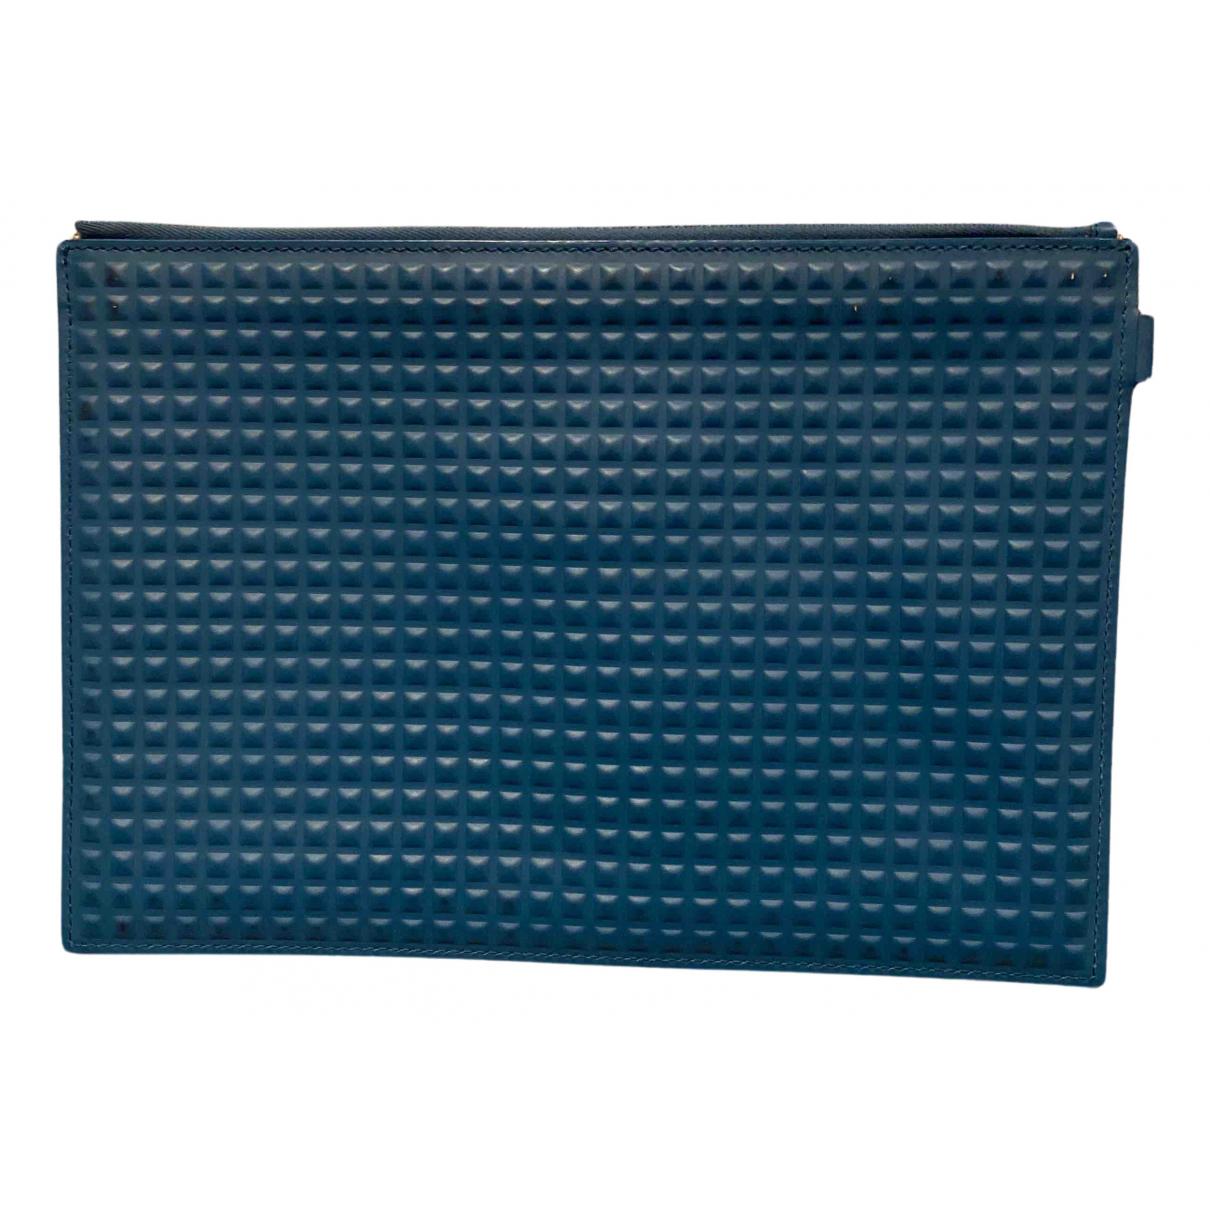 Balenciaga - Petite maroquinerie   pour homme en cuir - bleu